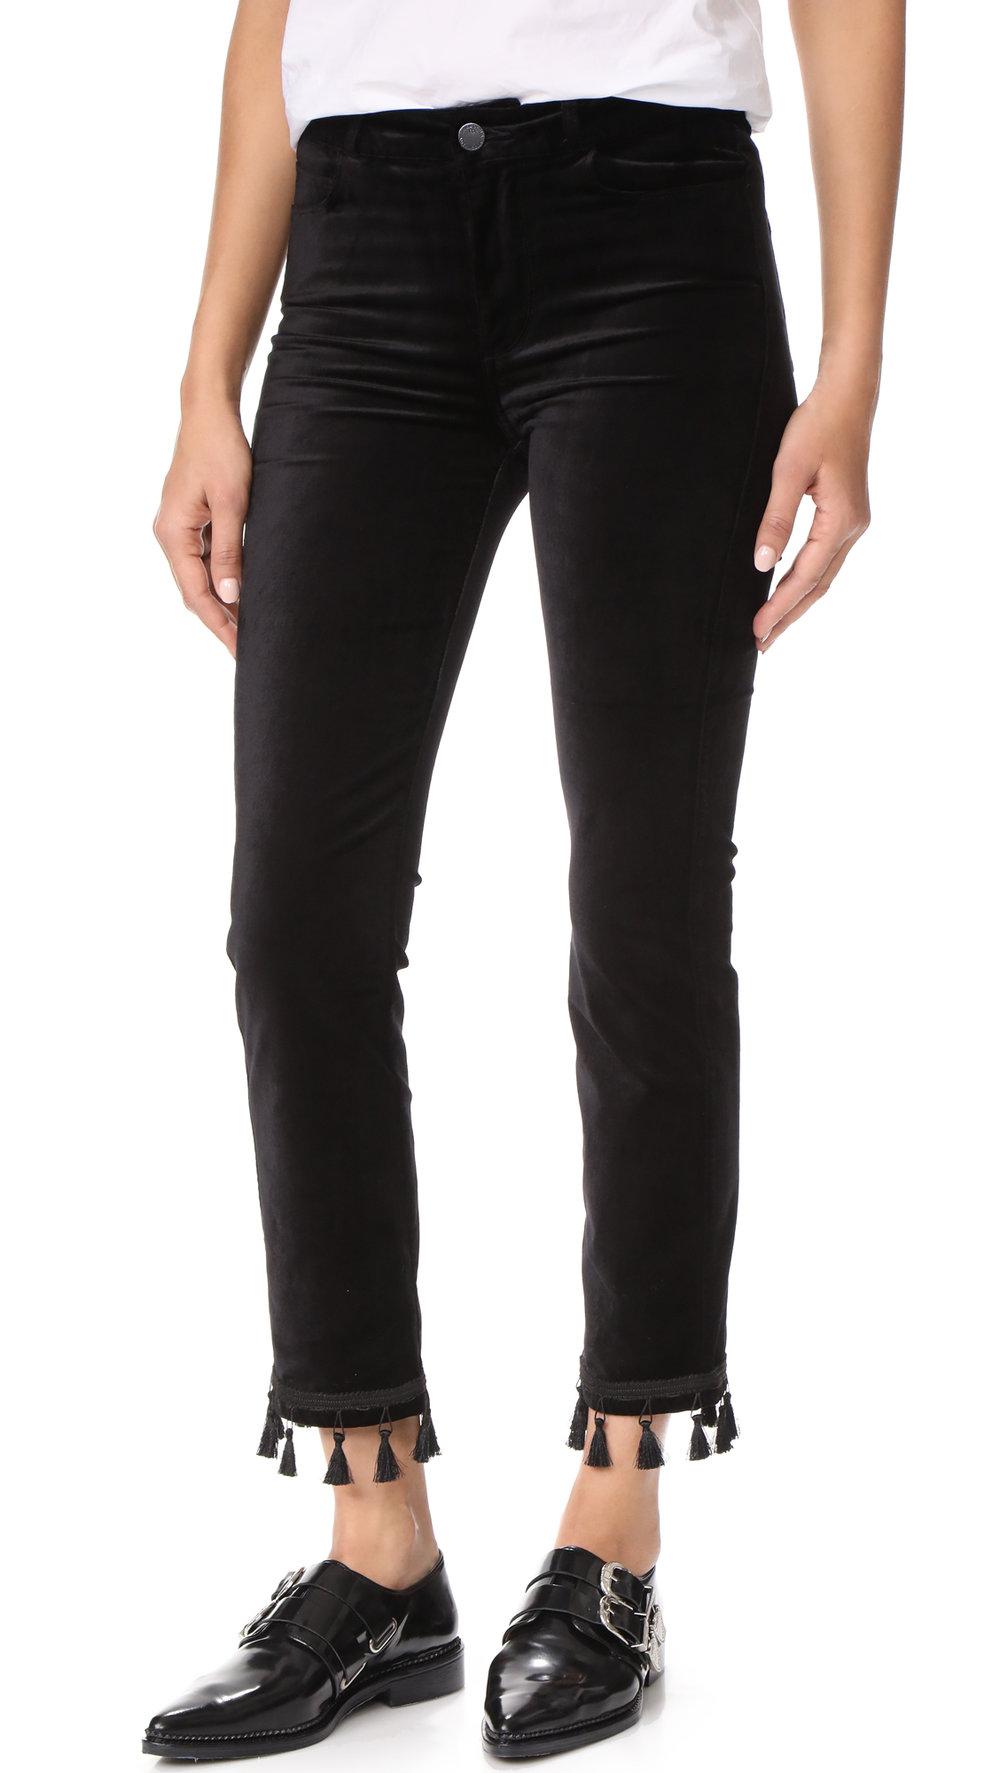 ff black jeans3.jpg